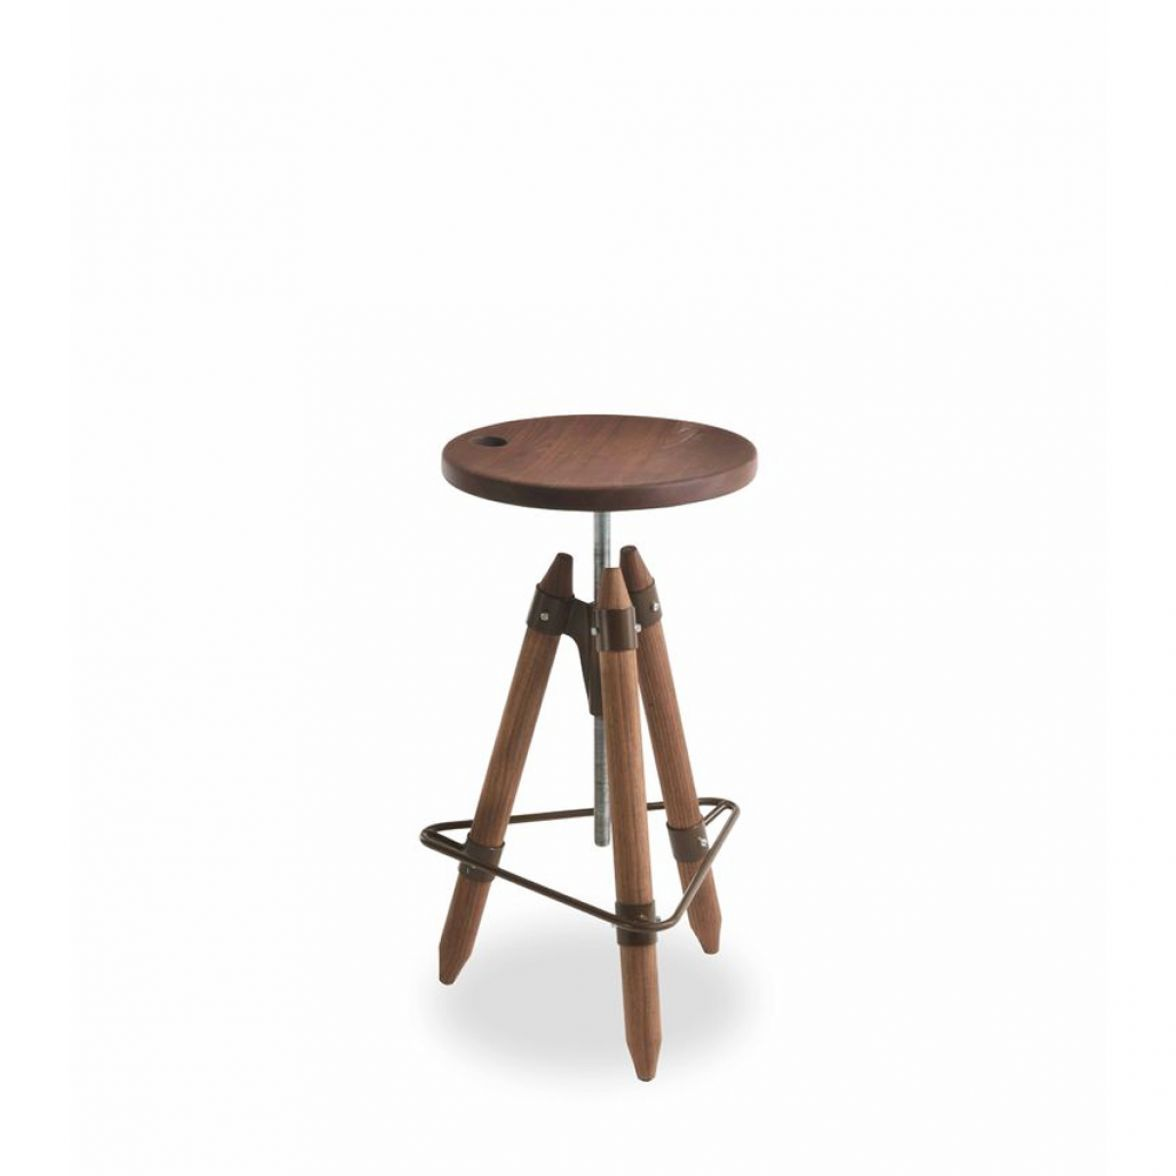 Ello stool